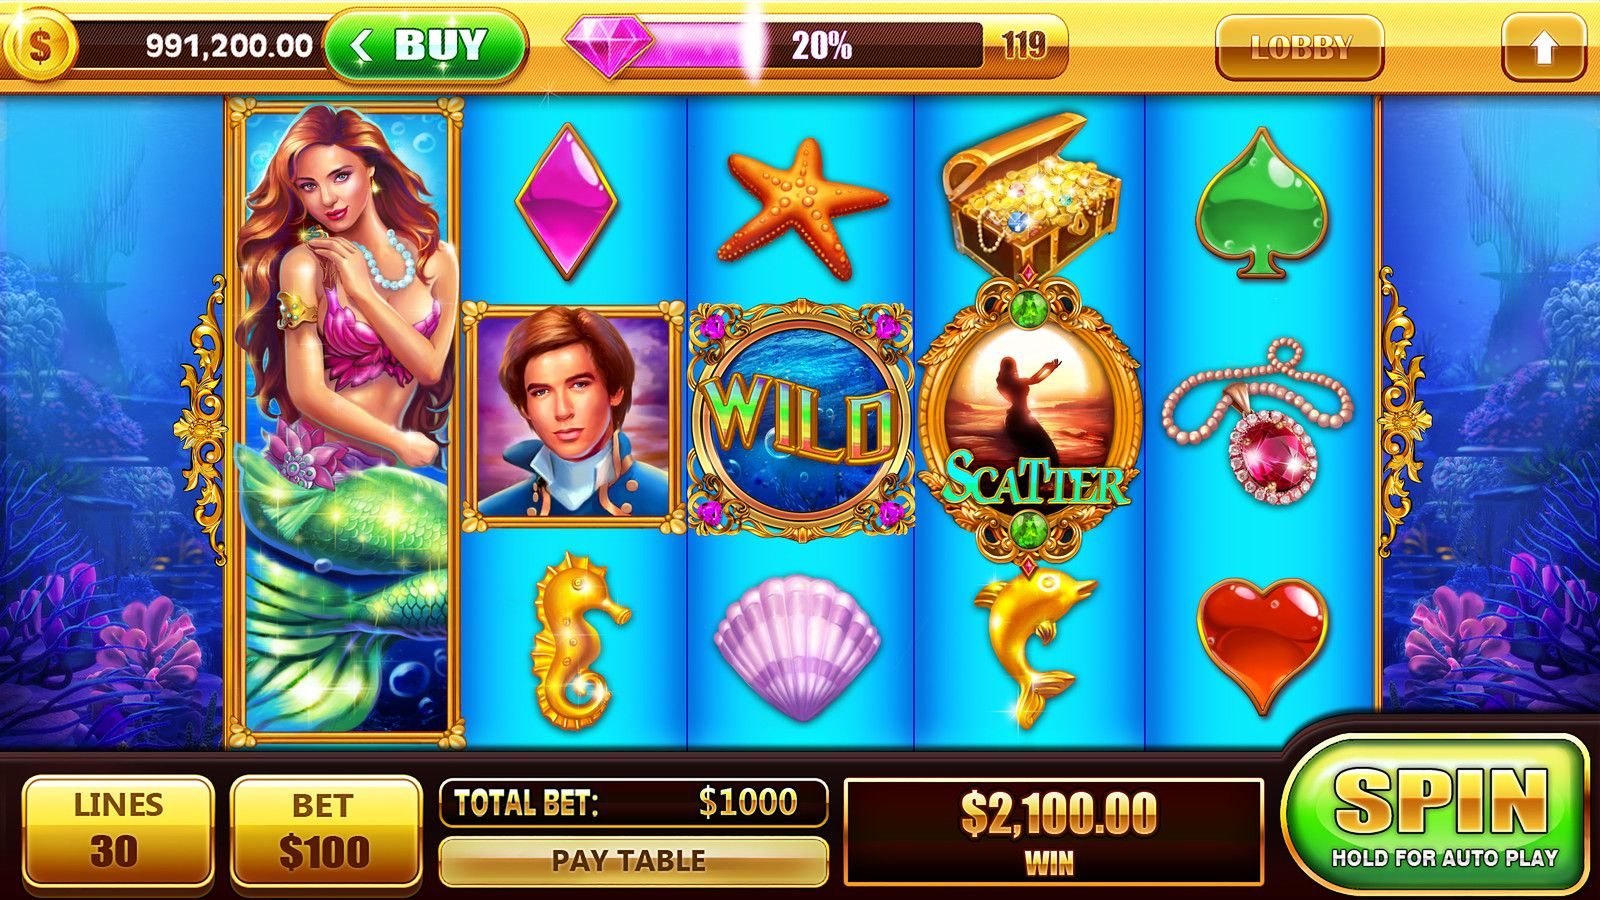 new online casino no deposit bonus 2019